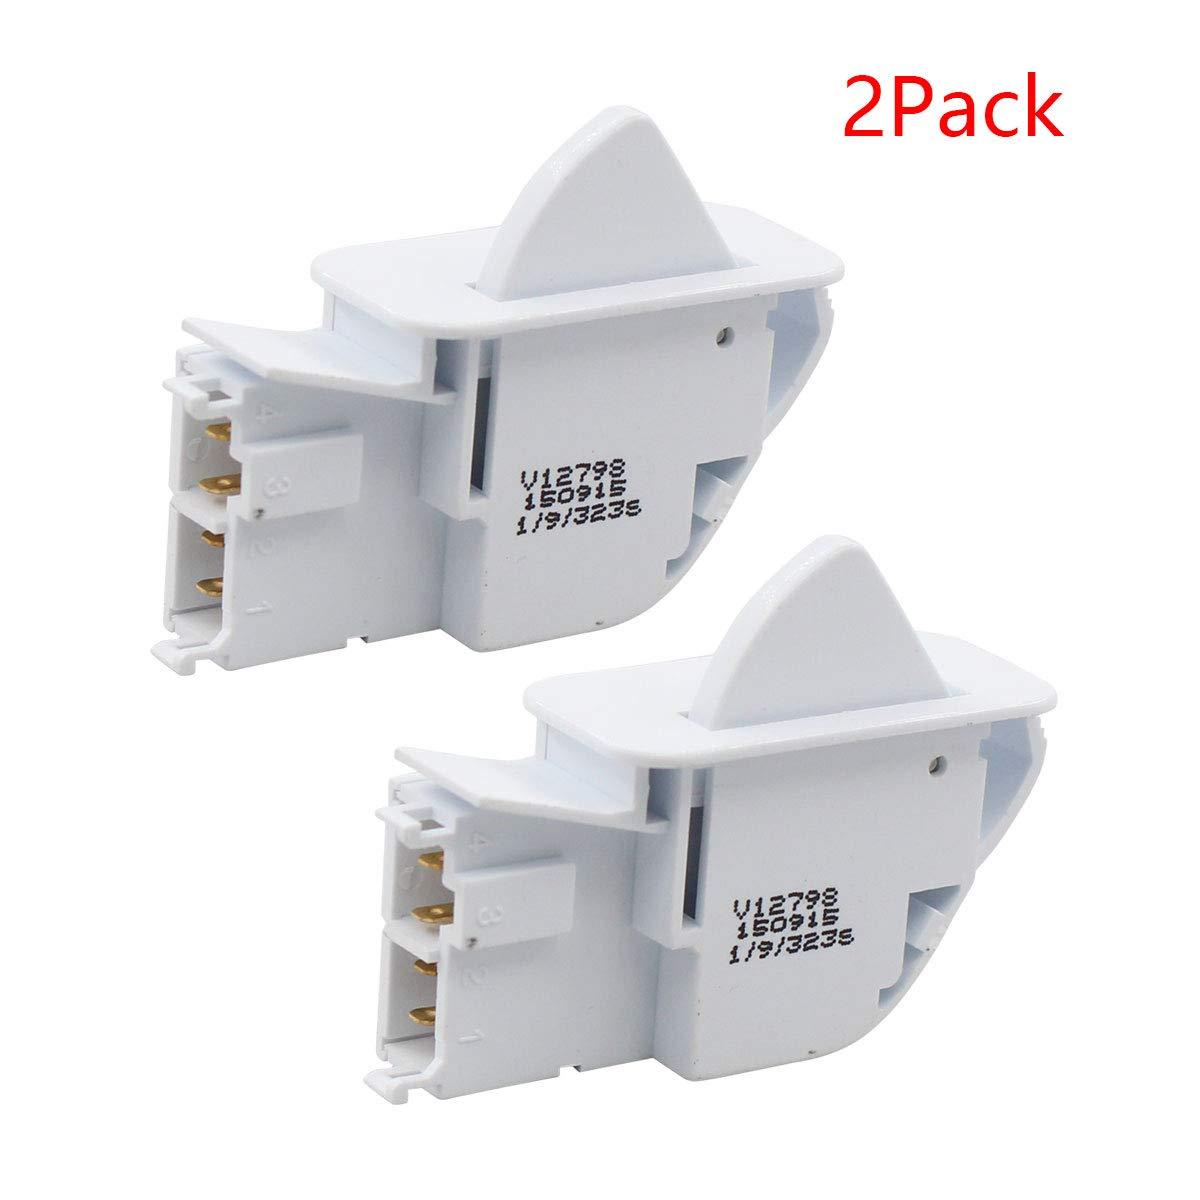 ApplianPar 2 Pack 6600JB1010A Refrigerator Door Push Button Switch for LG Kenmore Refrigerators AP4442090 6600JB1010K 1268243 6600JB1004A